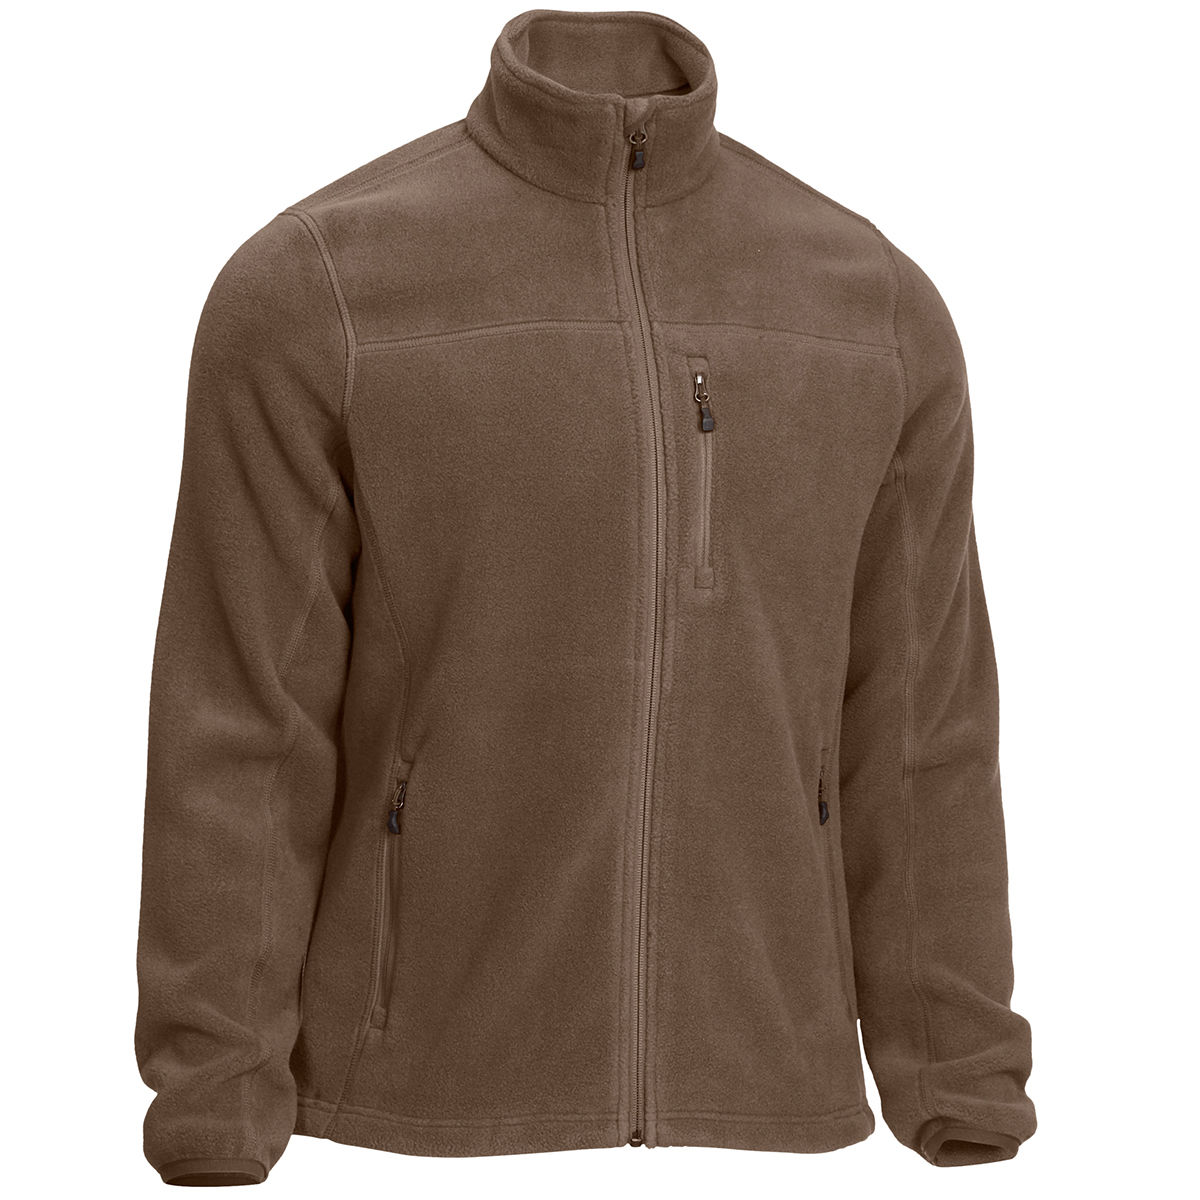 EMS Classic 200 Jacket